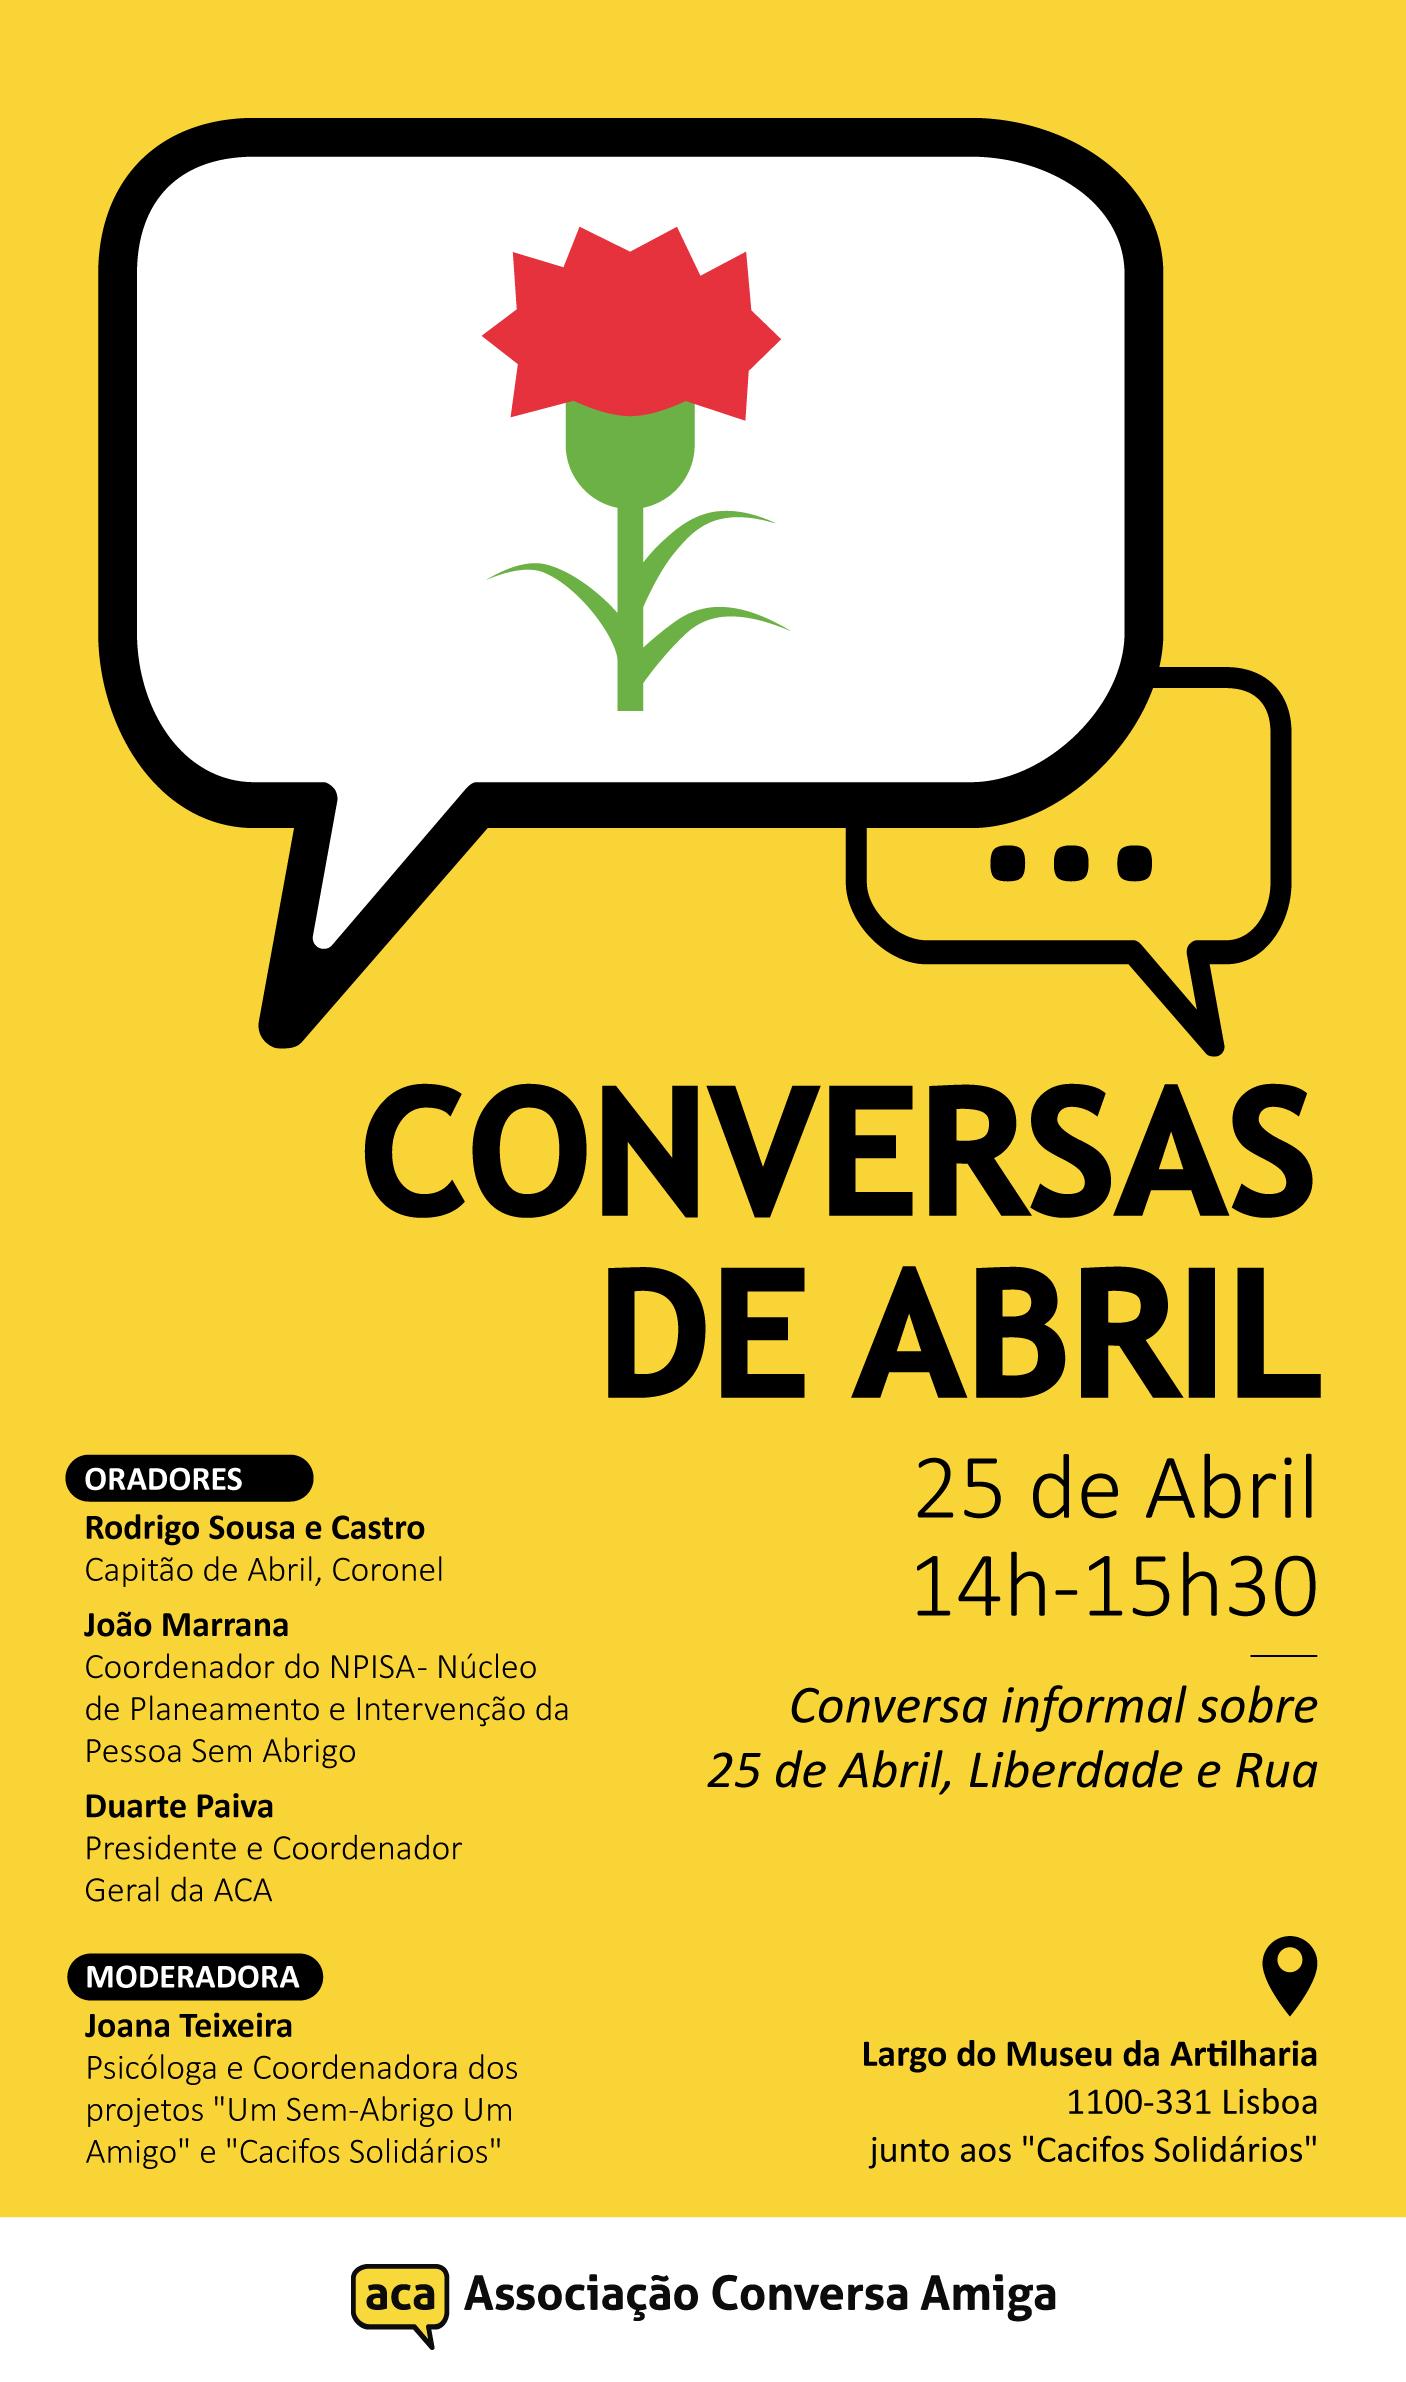 Conversas de Abril | 25 de Abril, Liberdade & Rua